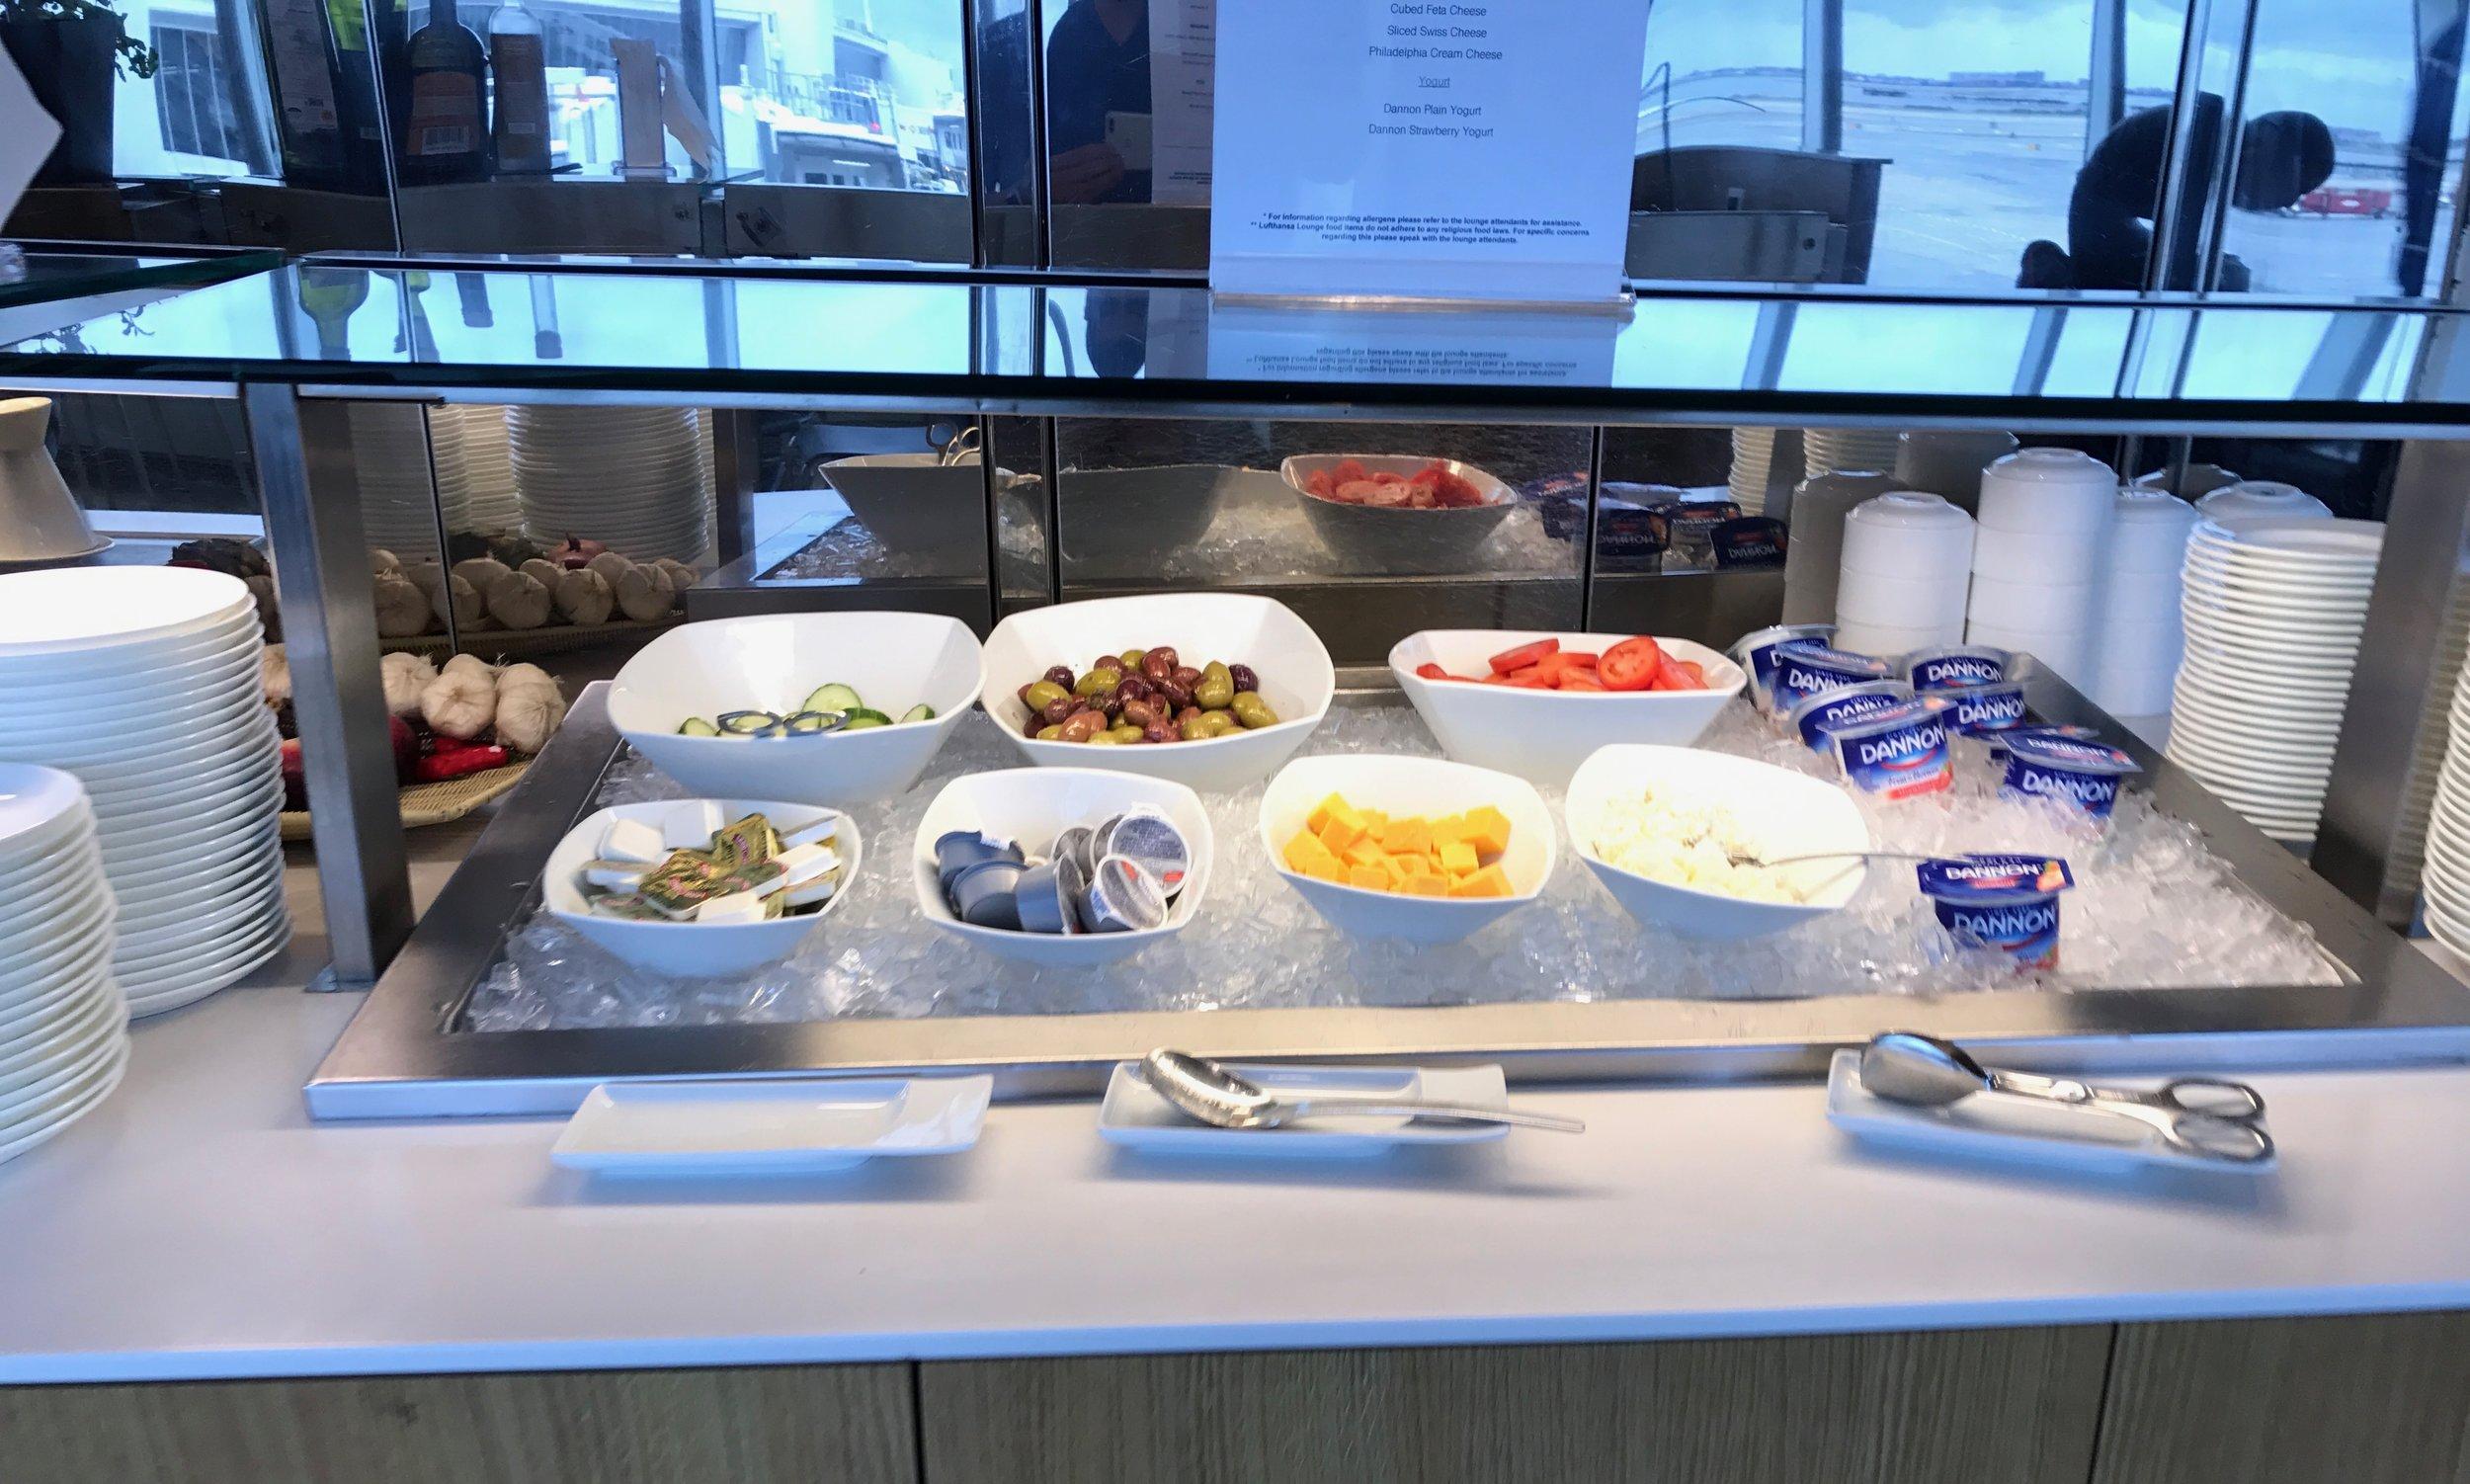 Buffet breakfast - cold items